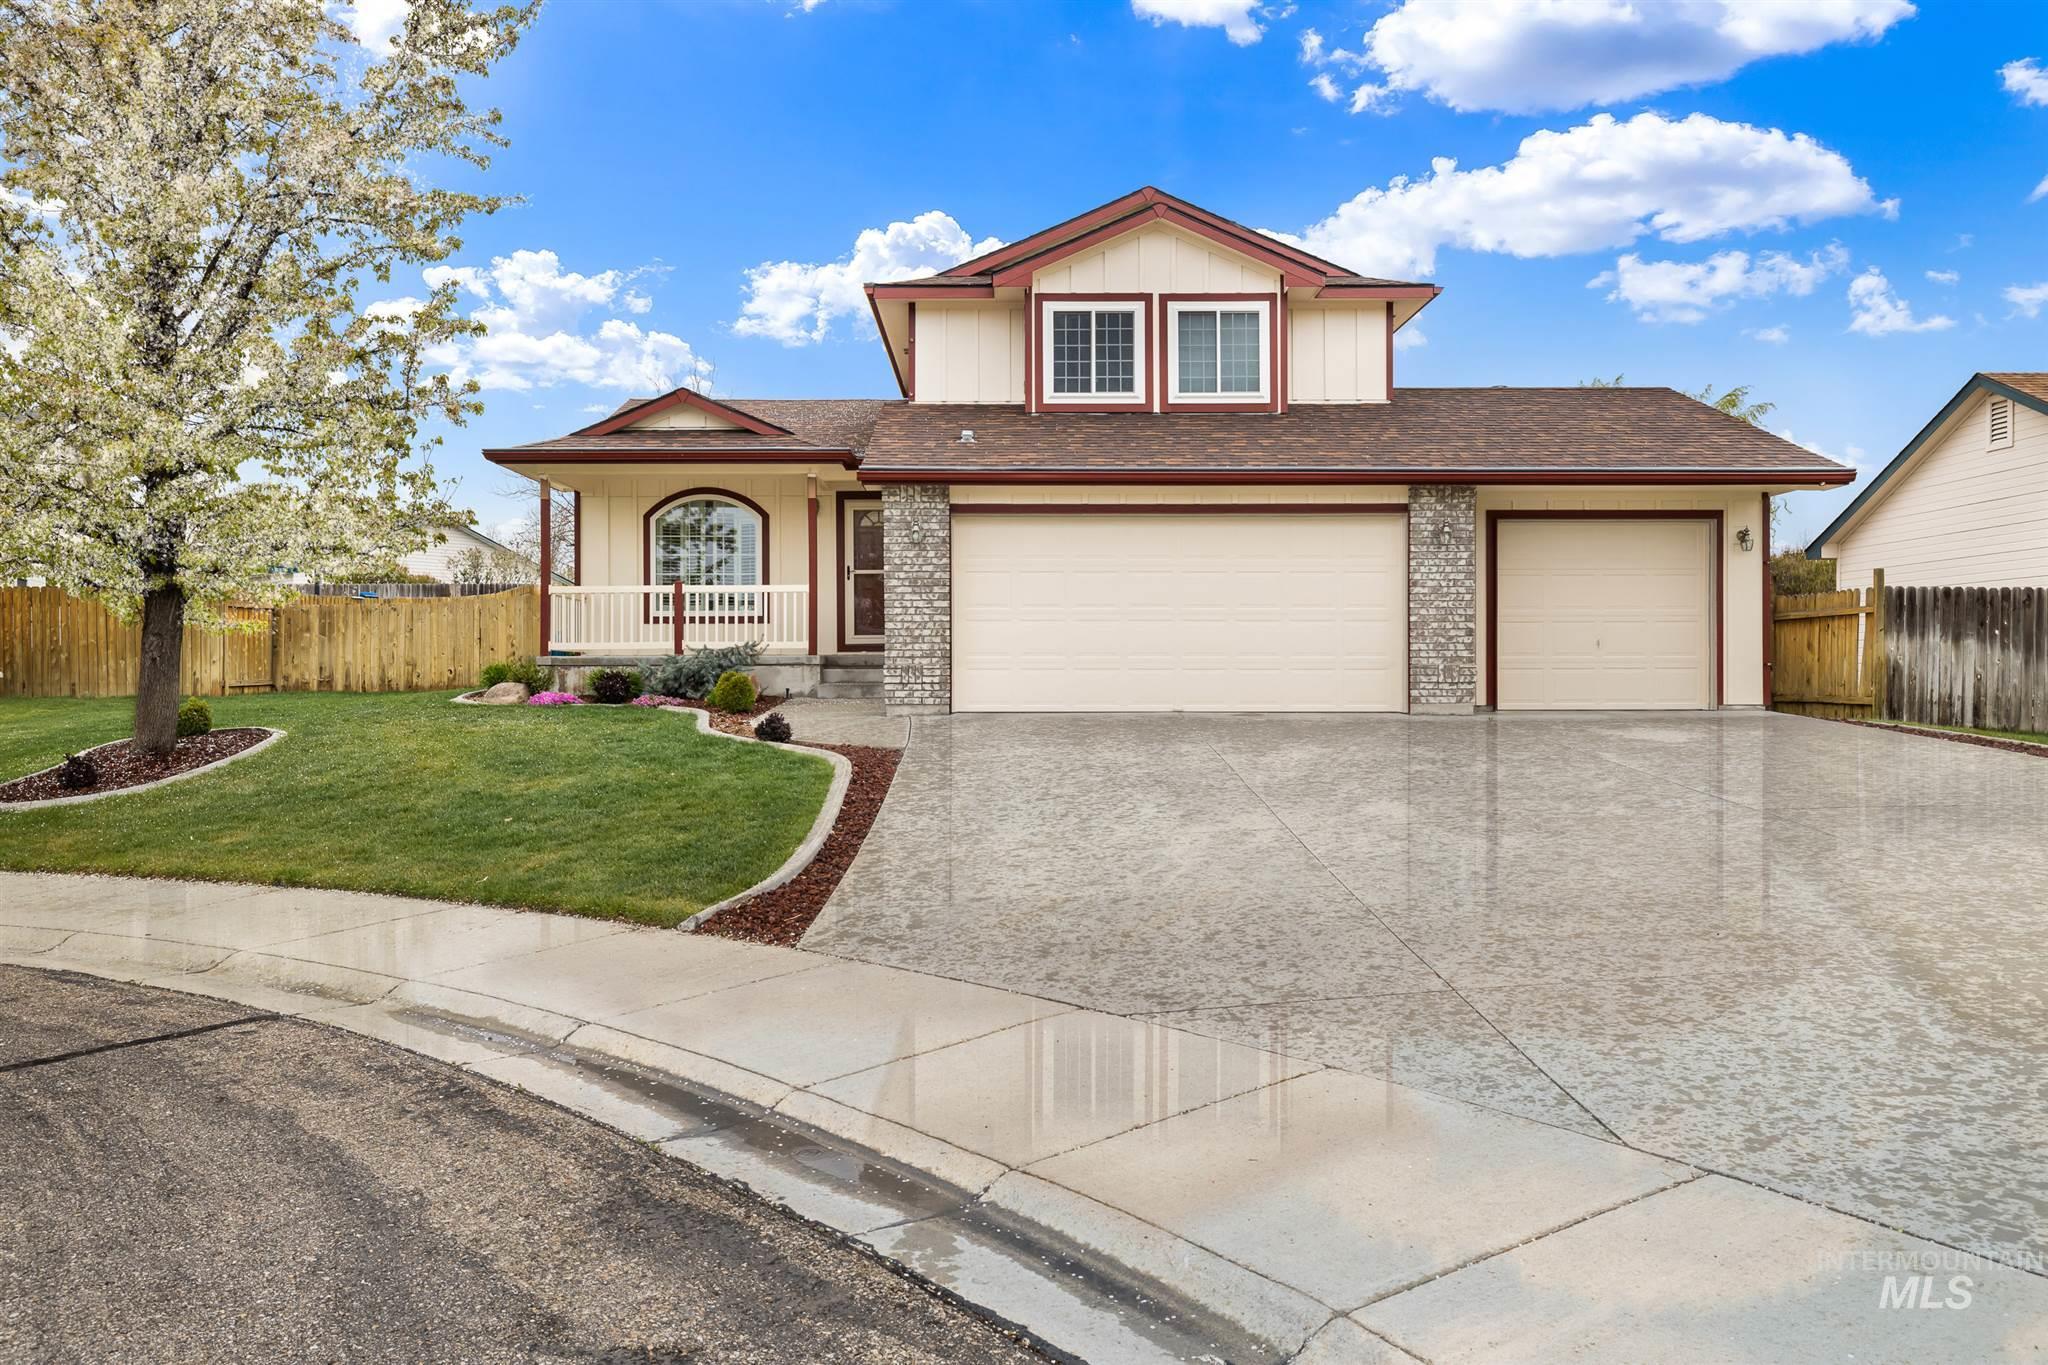 1426 N TASAVOL AVE Property Photo - Kuna, ID real estate listing